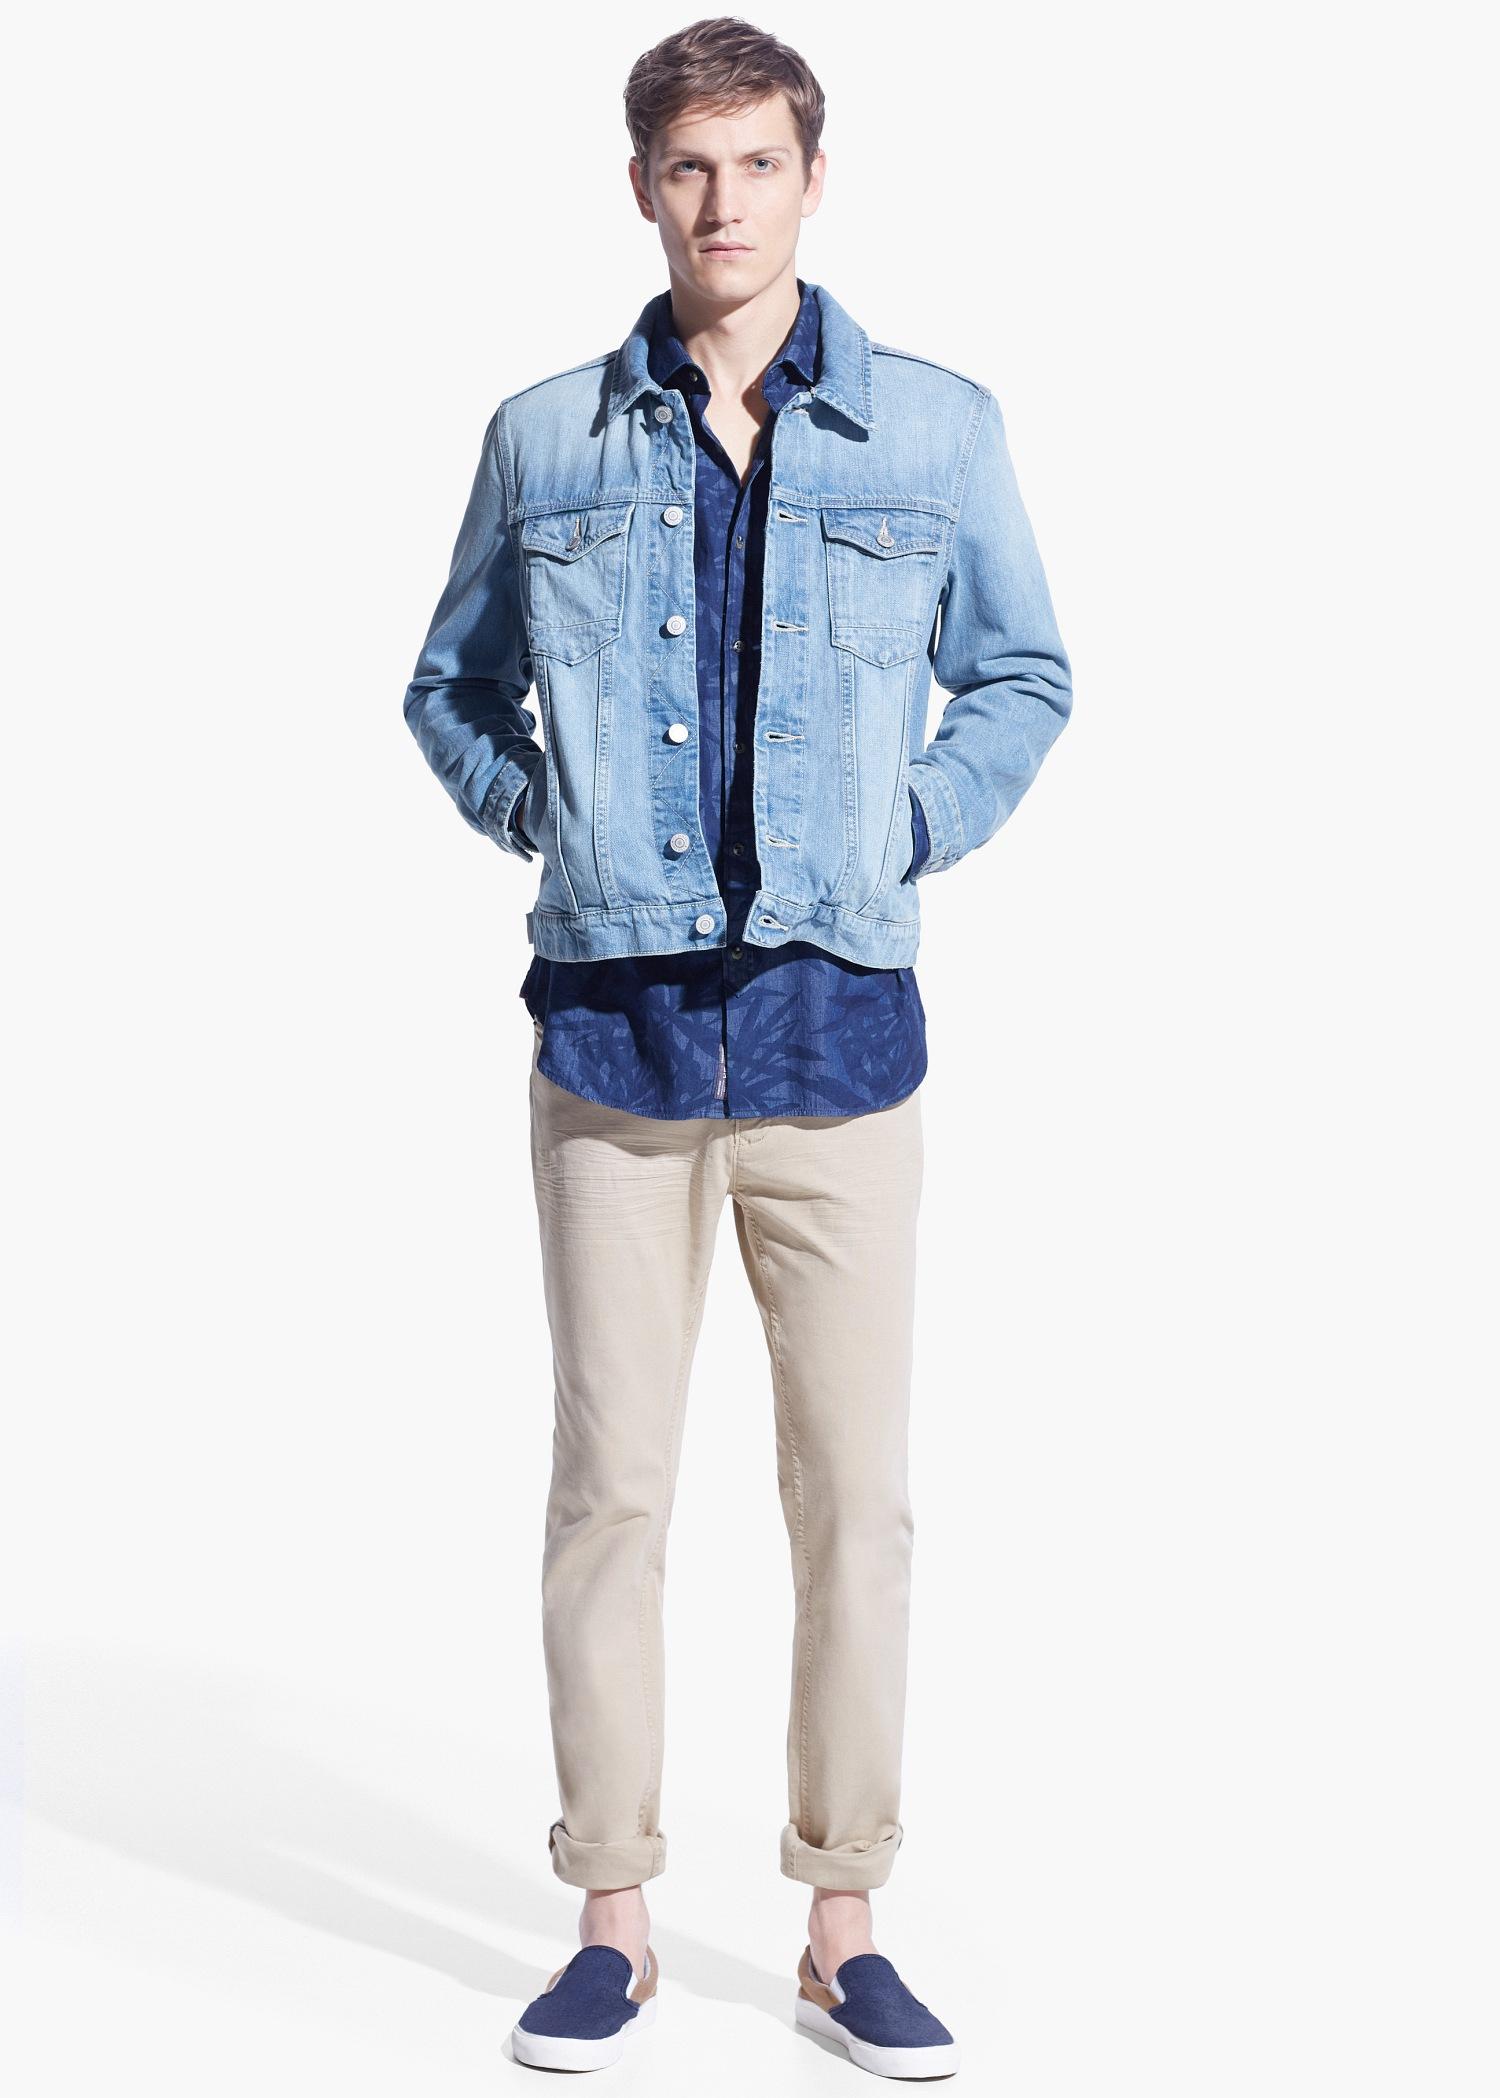 da3d772e5c0 Lyst - Mango Light Wash Denim Jacket in Blue for Men